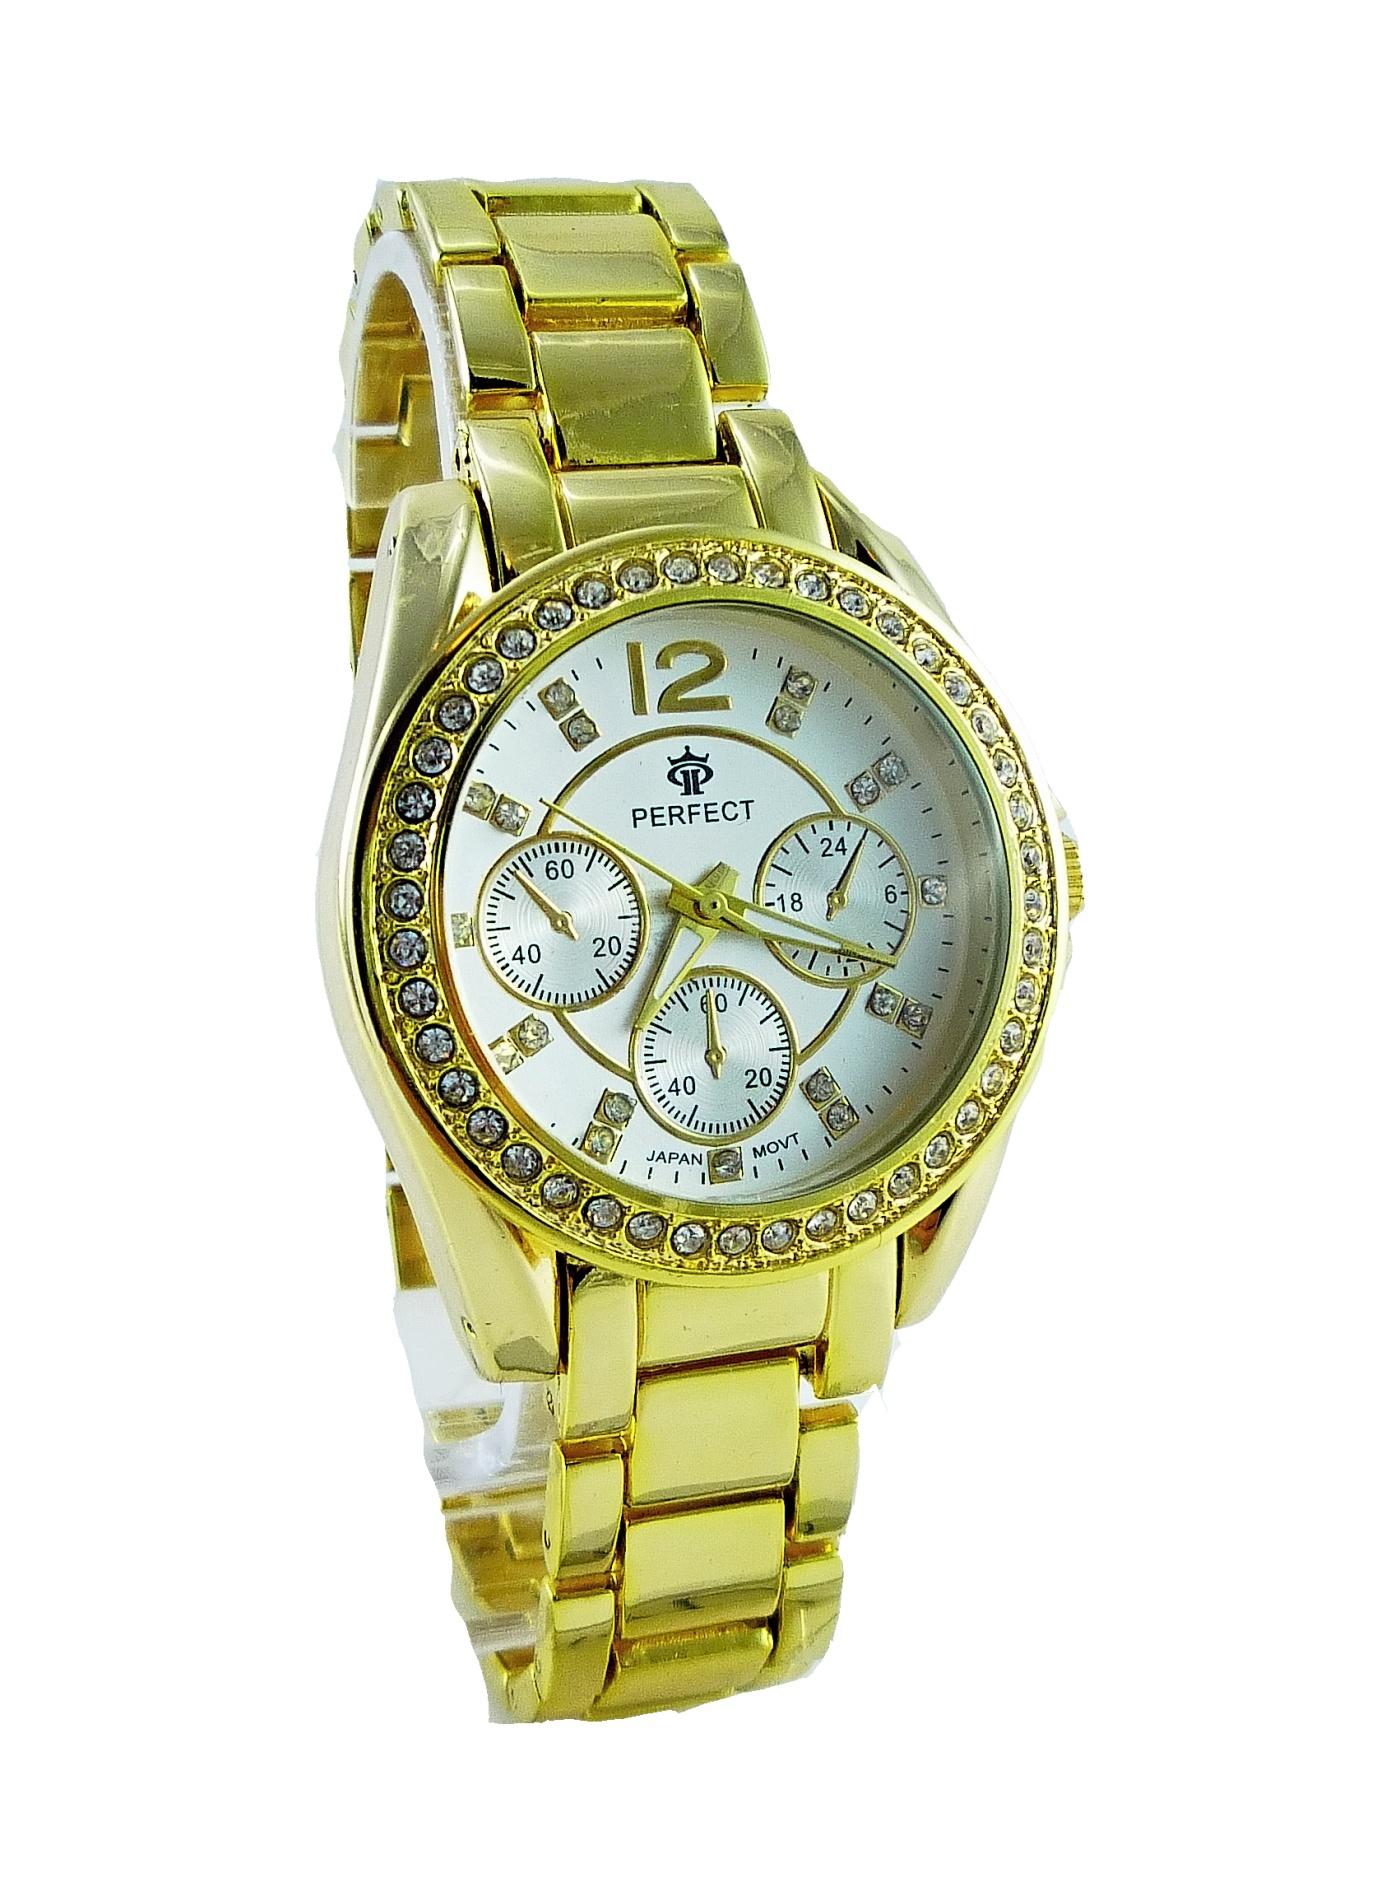 Dámské hodinky Perfekt zlaté 062D